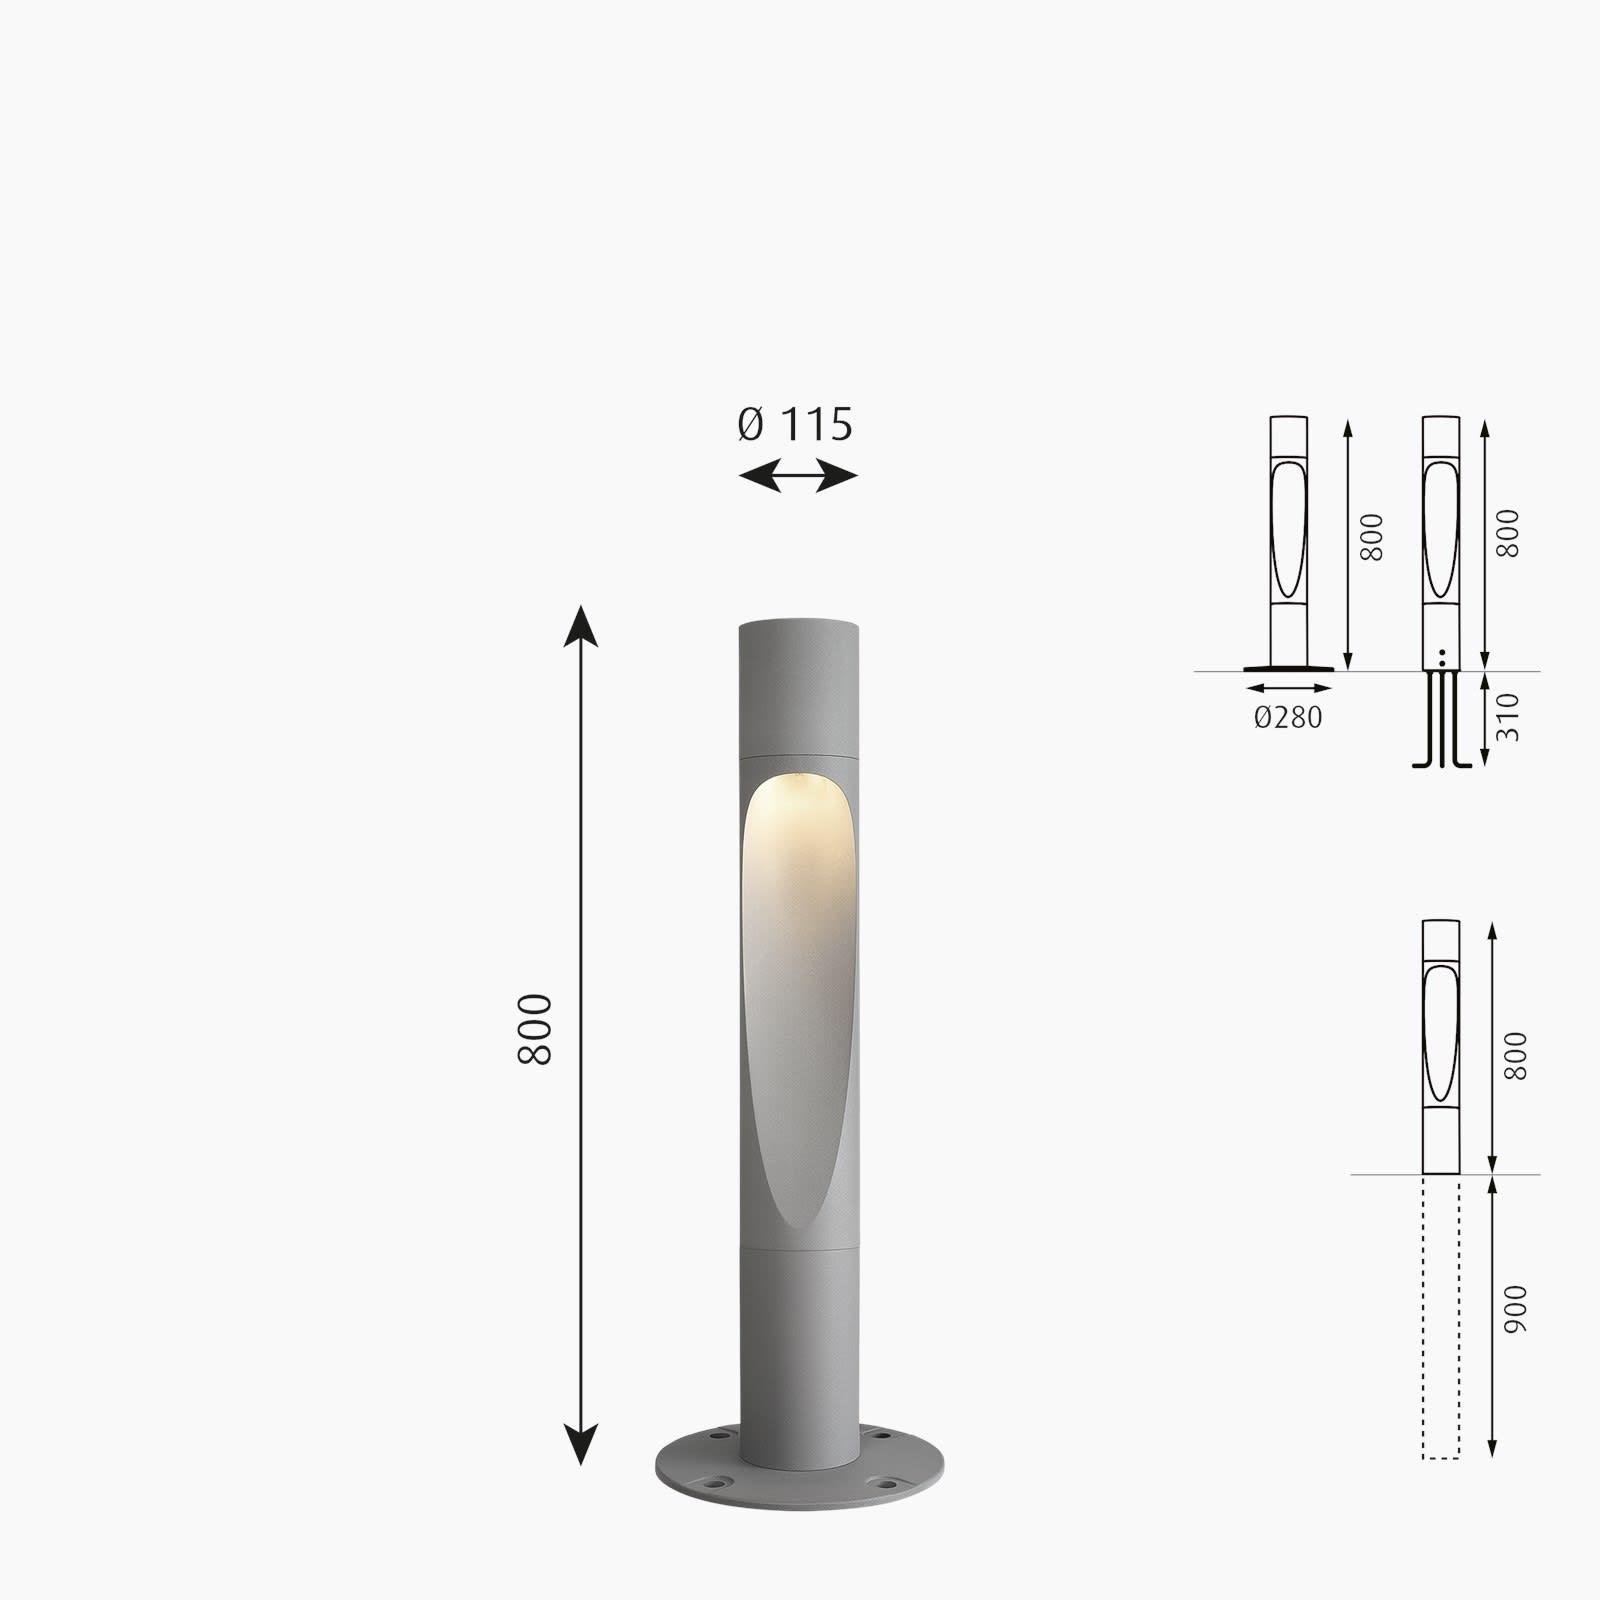 louis-poulsen-flindt-bollard-lamp-dimensions